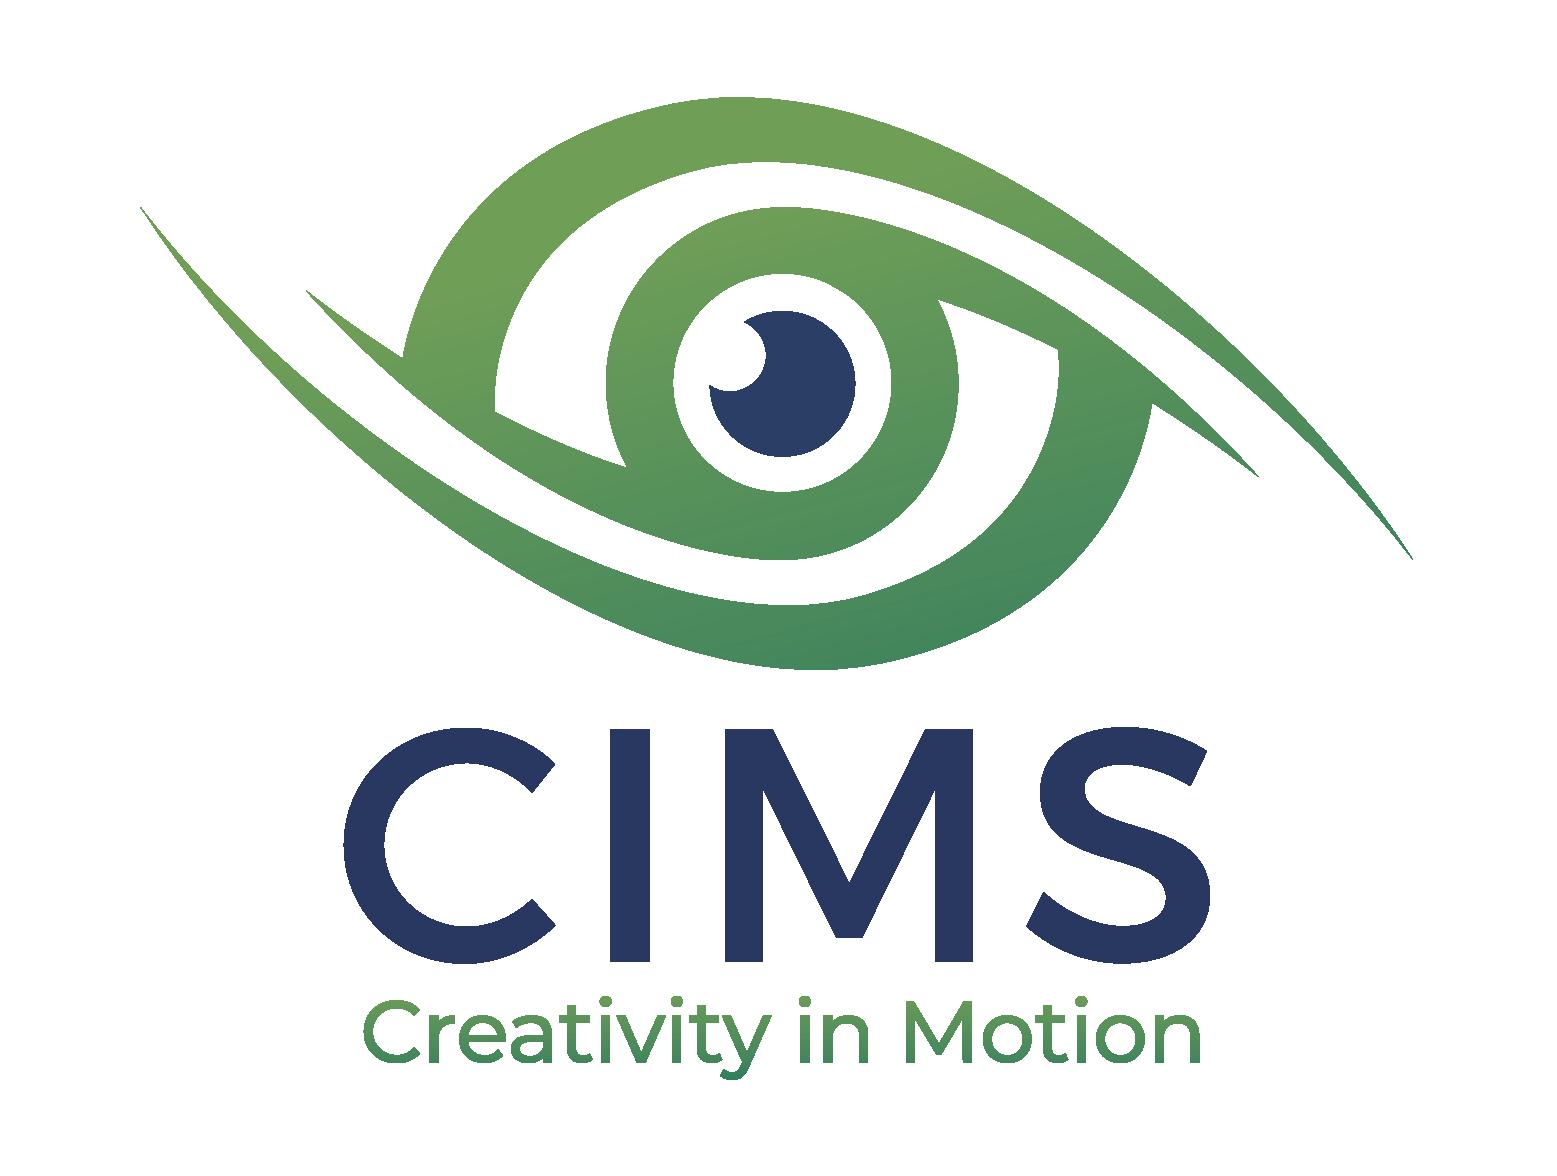 CIMS China Ltd.